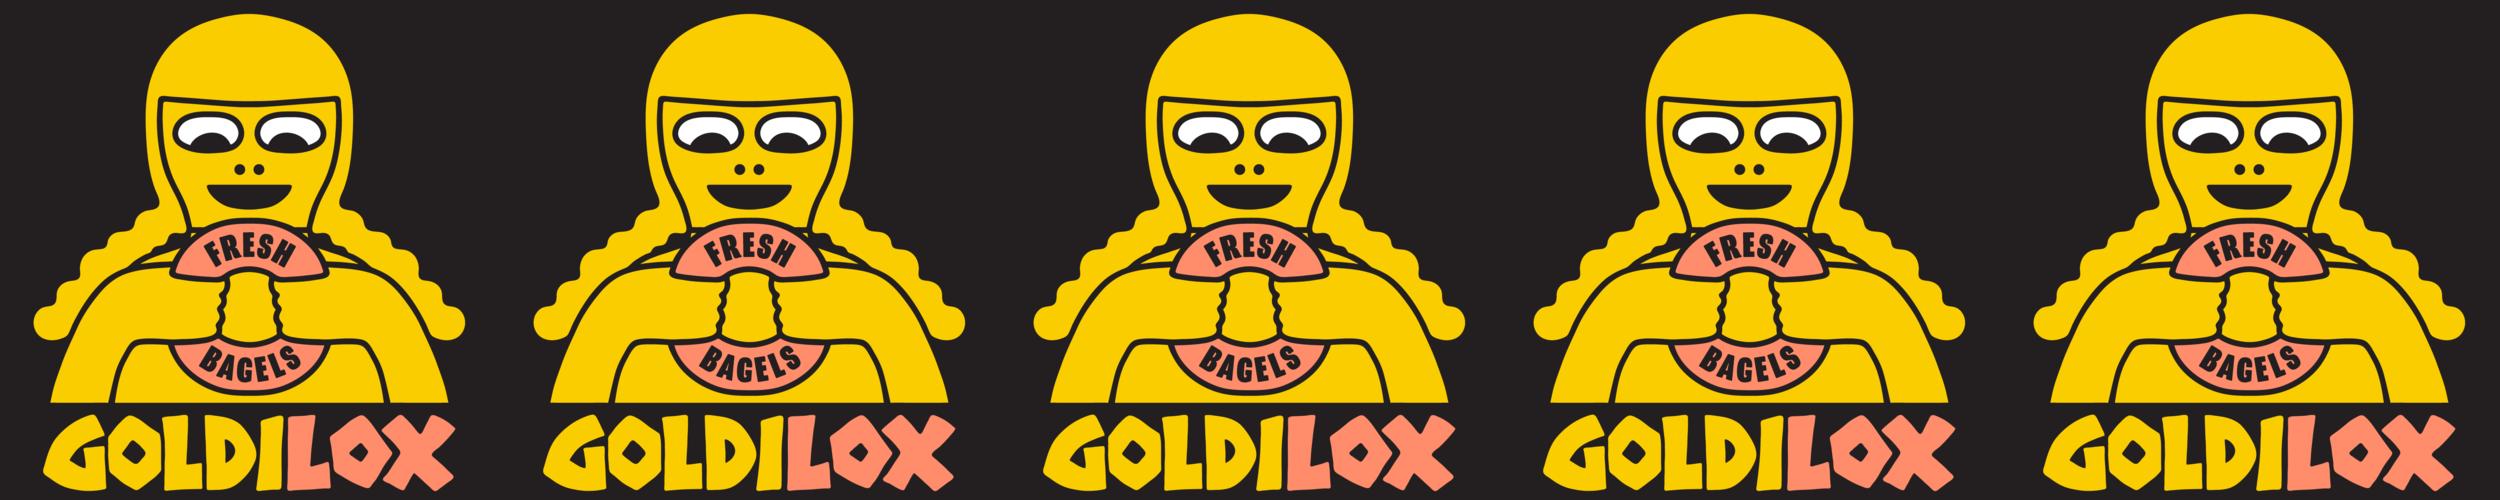 GoldHeadBand.png